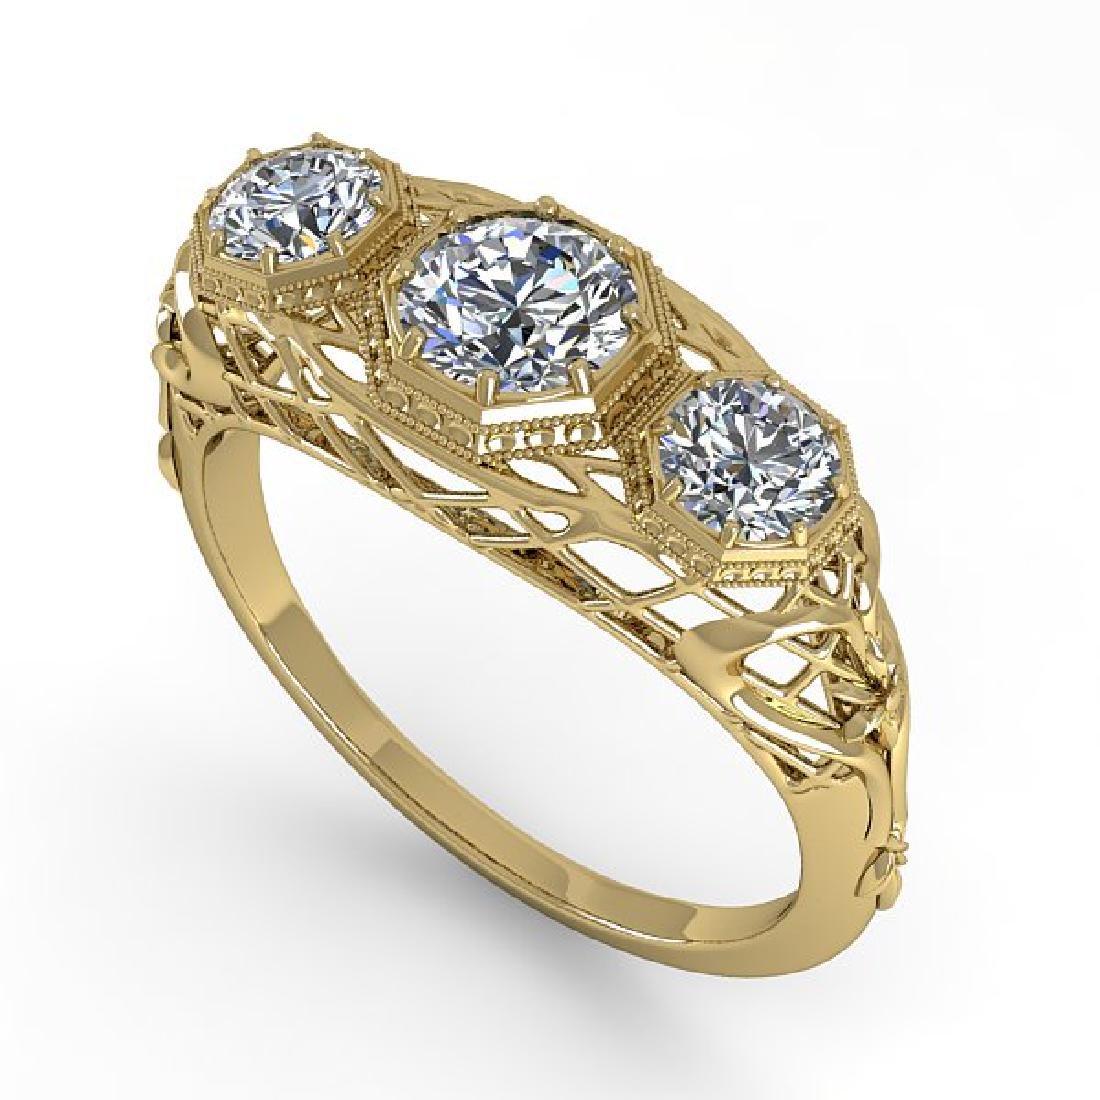 1.00 CTW VS/SI Diamond Art Deco Ring 14K Yellow Gold - 2